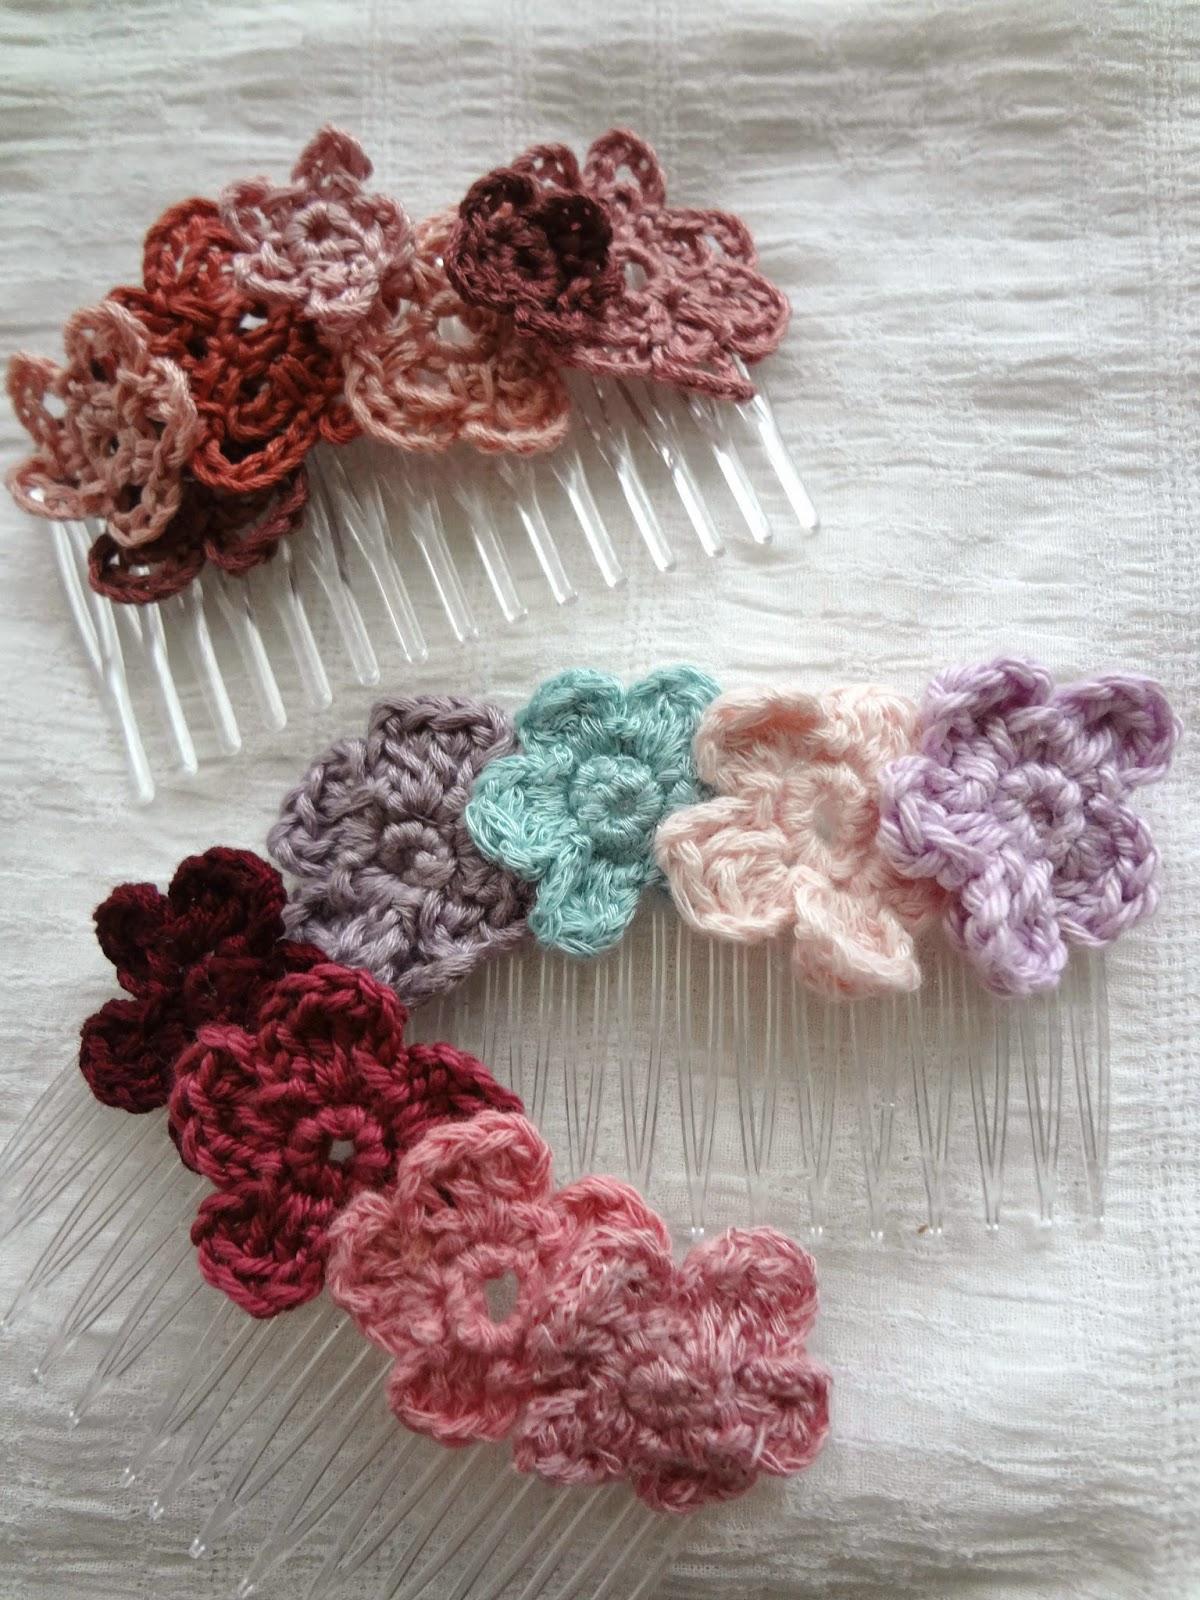 Little Treasures: Make a Flower Hair comb - free flower pattern